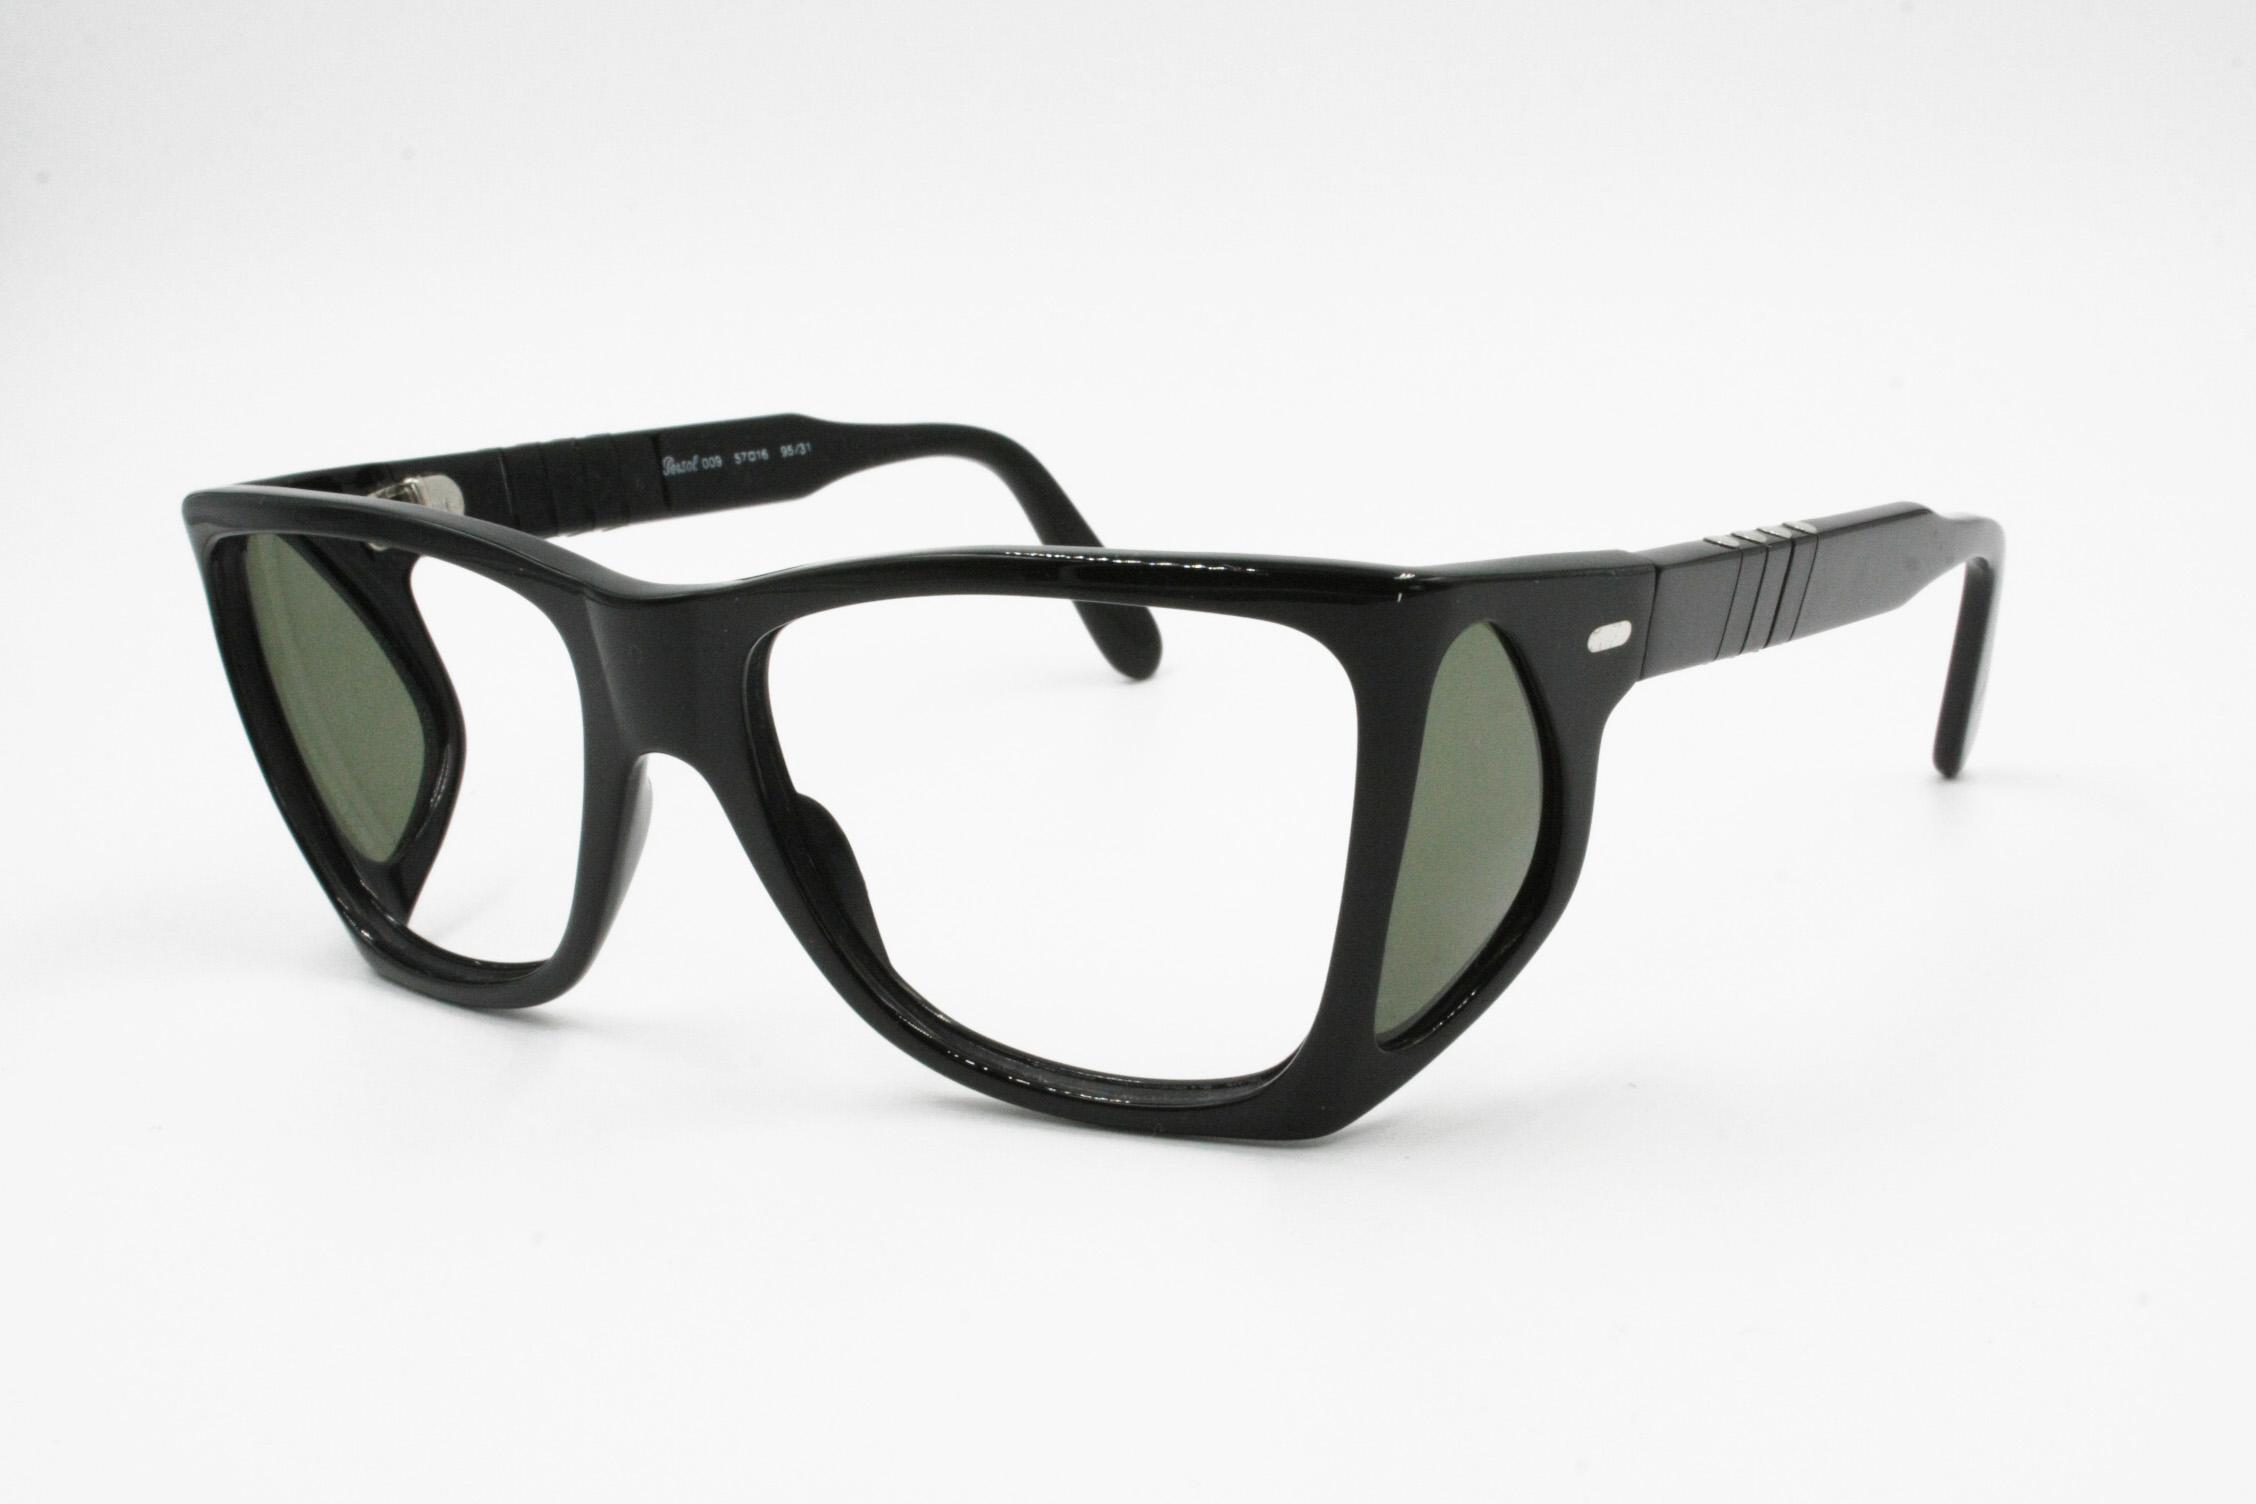 c1f931cb72 Persol PERSOL 009 95 31 Vintage sunglasses frame four lenses black color